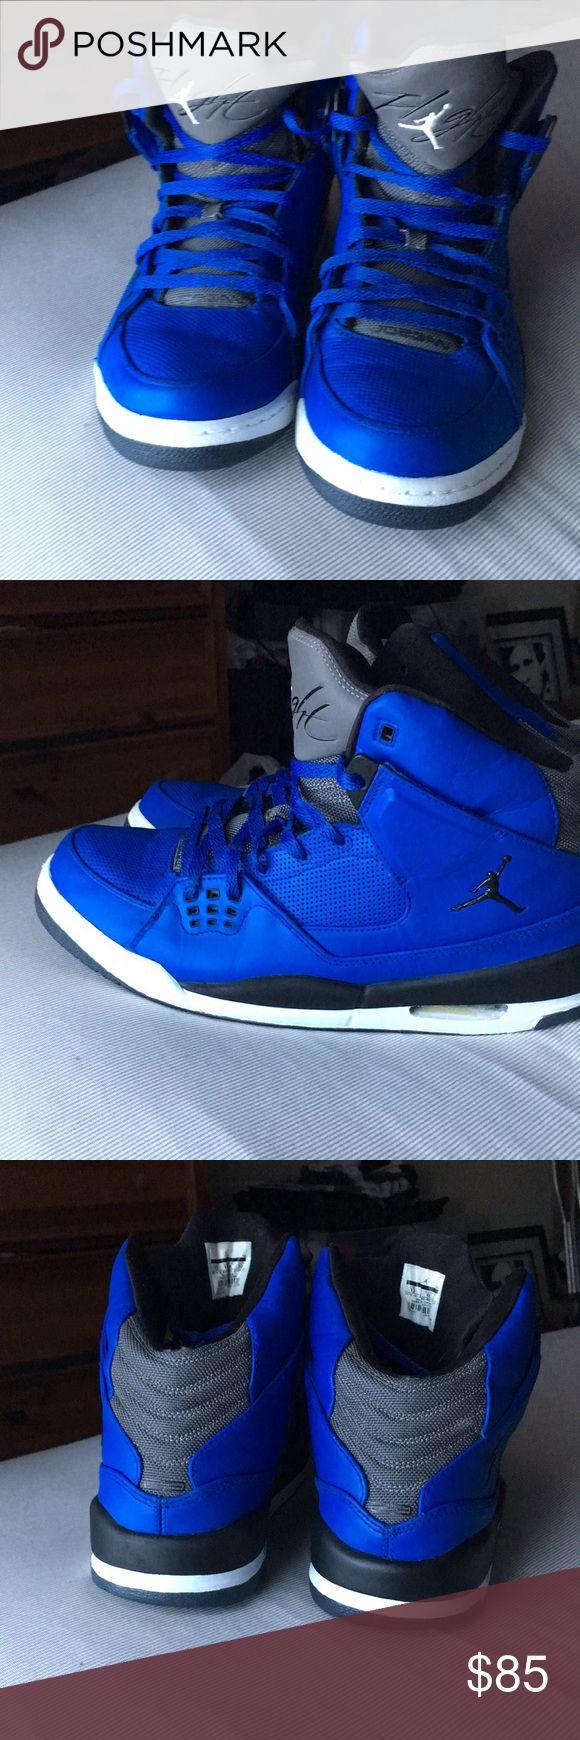 Air Jordan Flight 9 (Black and Blue) Black and Blue Jordan Flight 9 🔵⚫️ Very good condition!! Clean and comfortable. 9.5/10  🔥 Jordan Shoes Sneakers